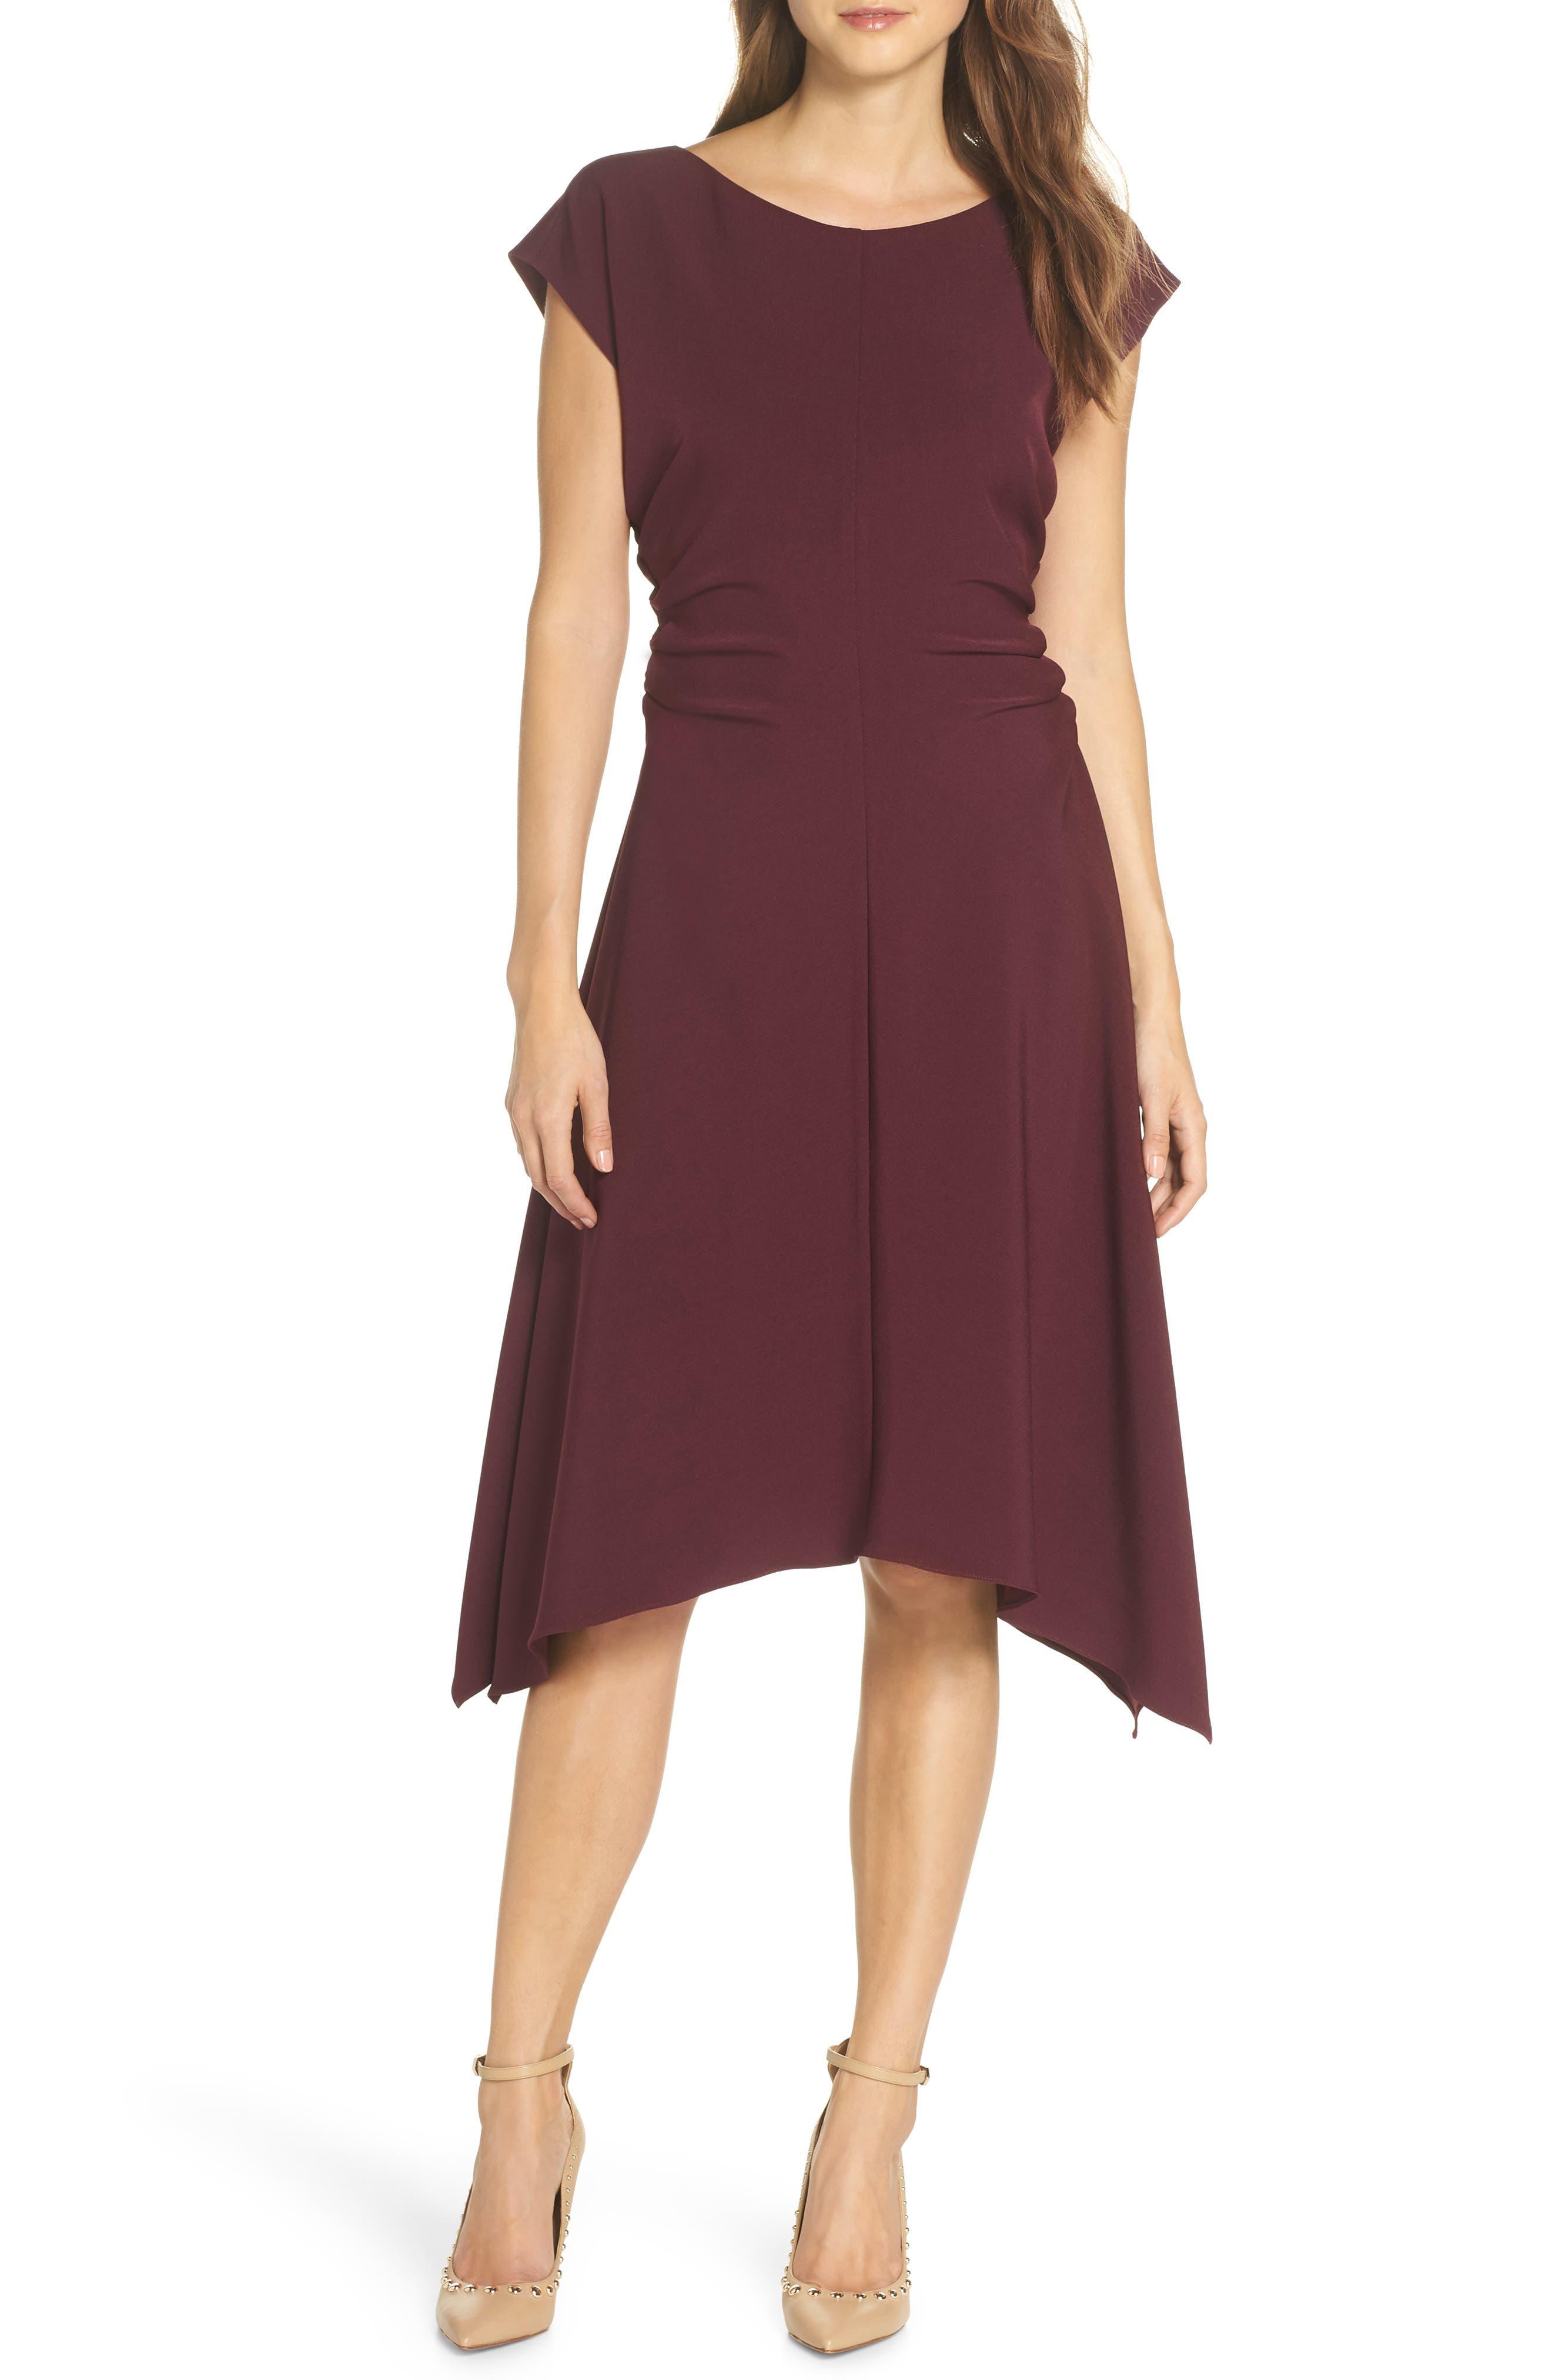 JULIA JORDAN,                             Ruched Stretch Crepe Fit & Flare Dress,                             Alternate thumbnail 6, color,                             PLUM